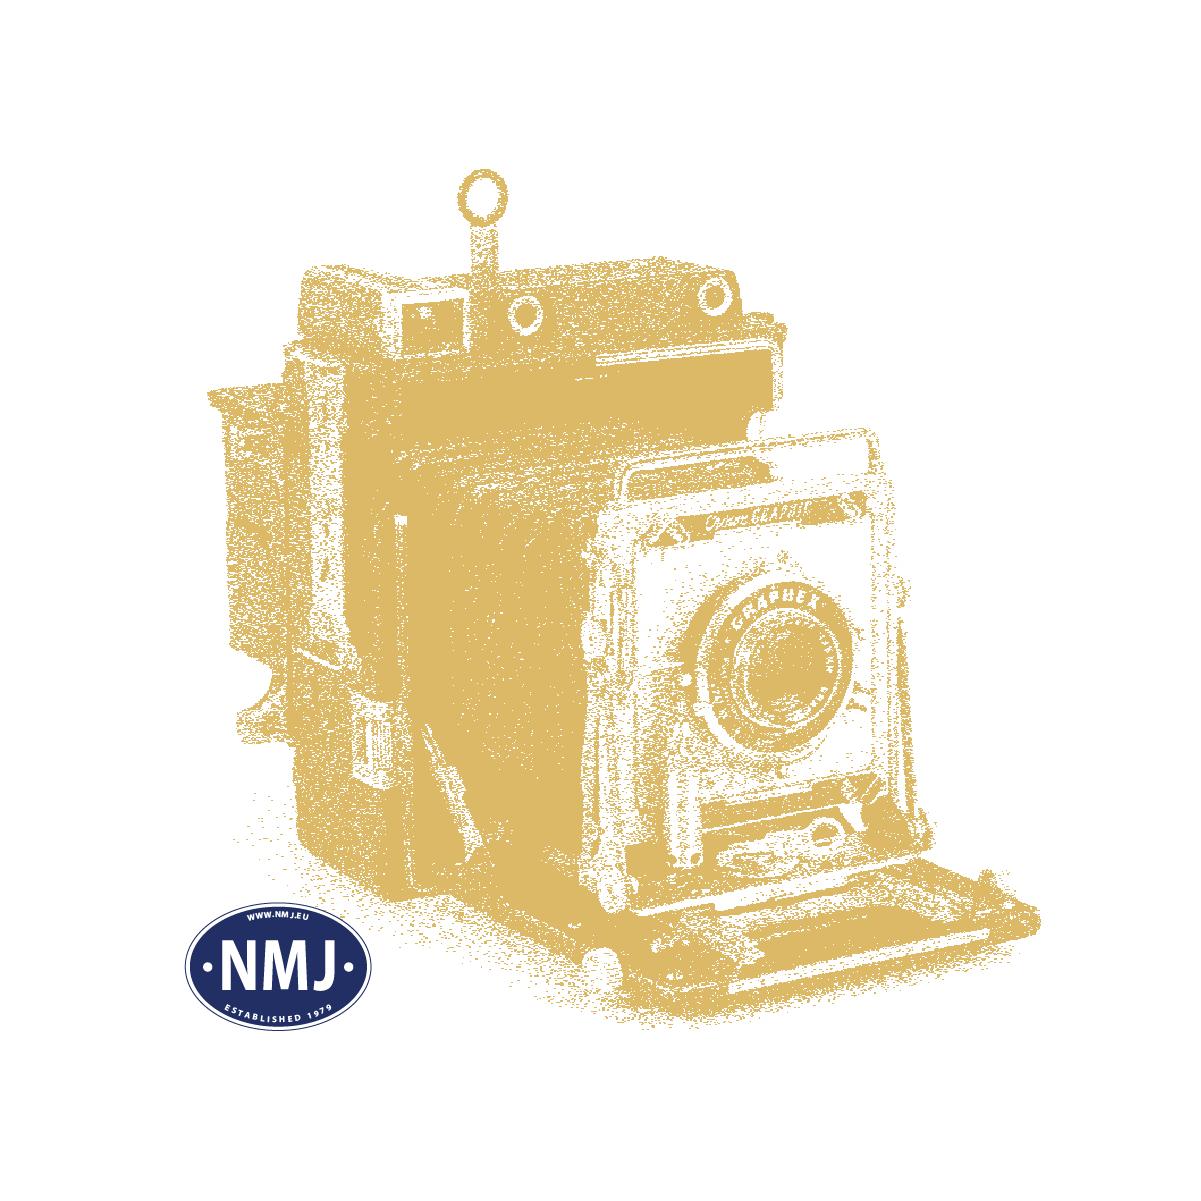 NIC0001 - Nohab Lokomotiven in Europa, Bildband